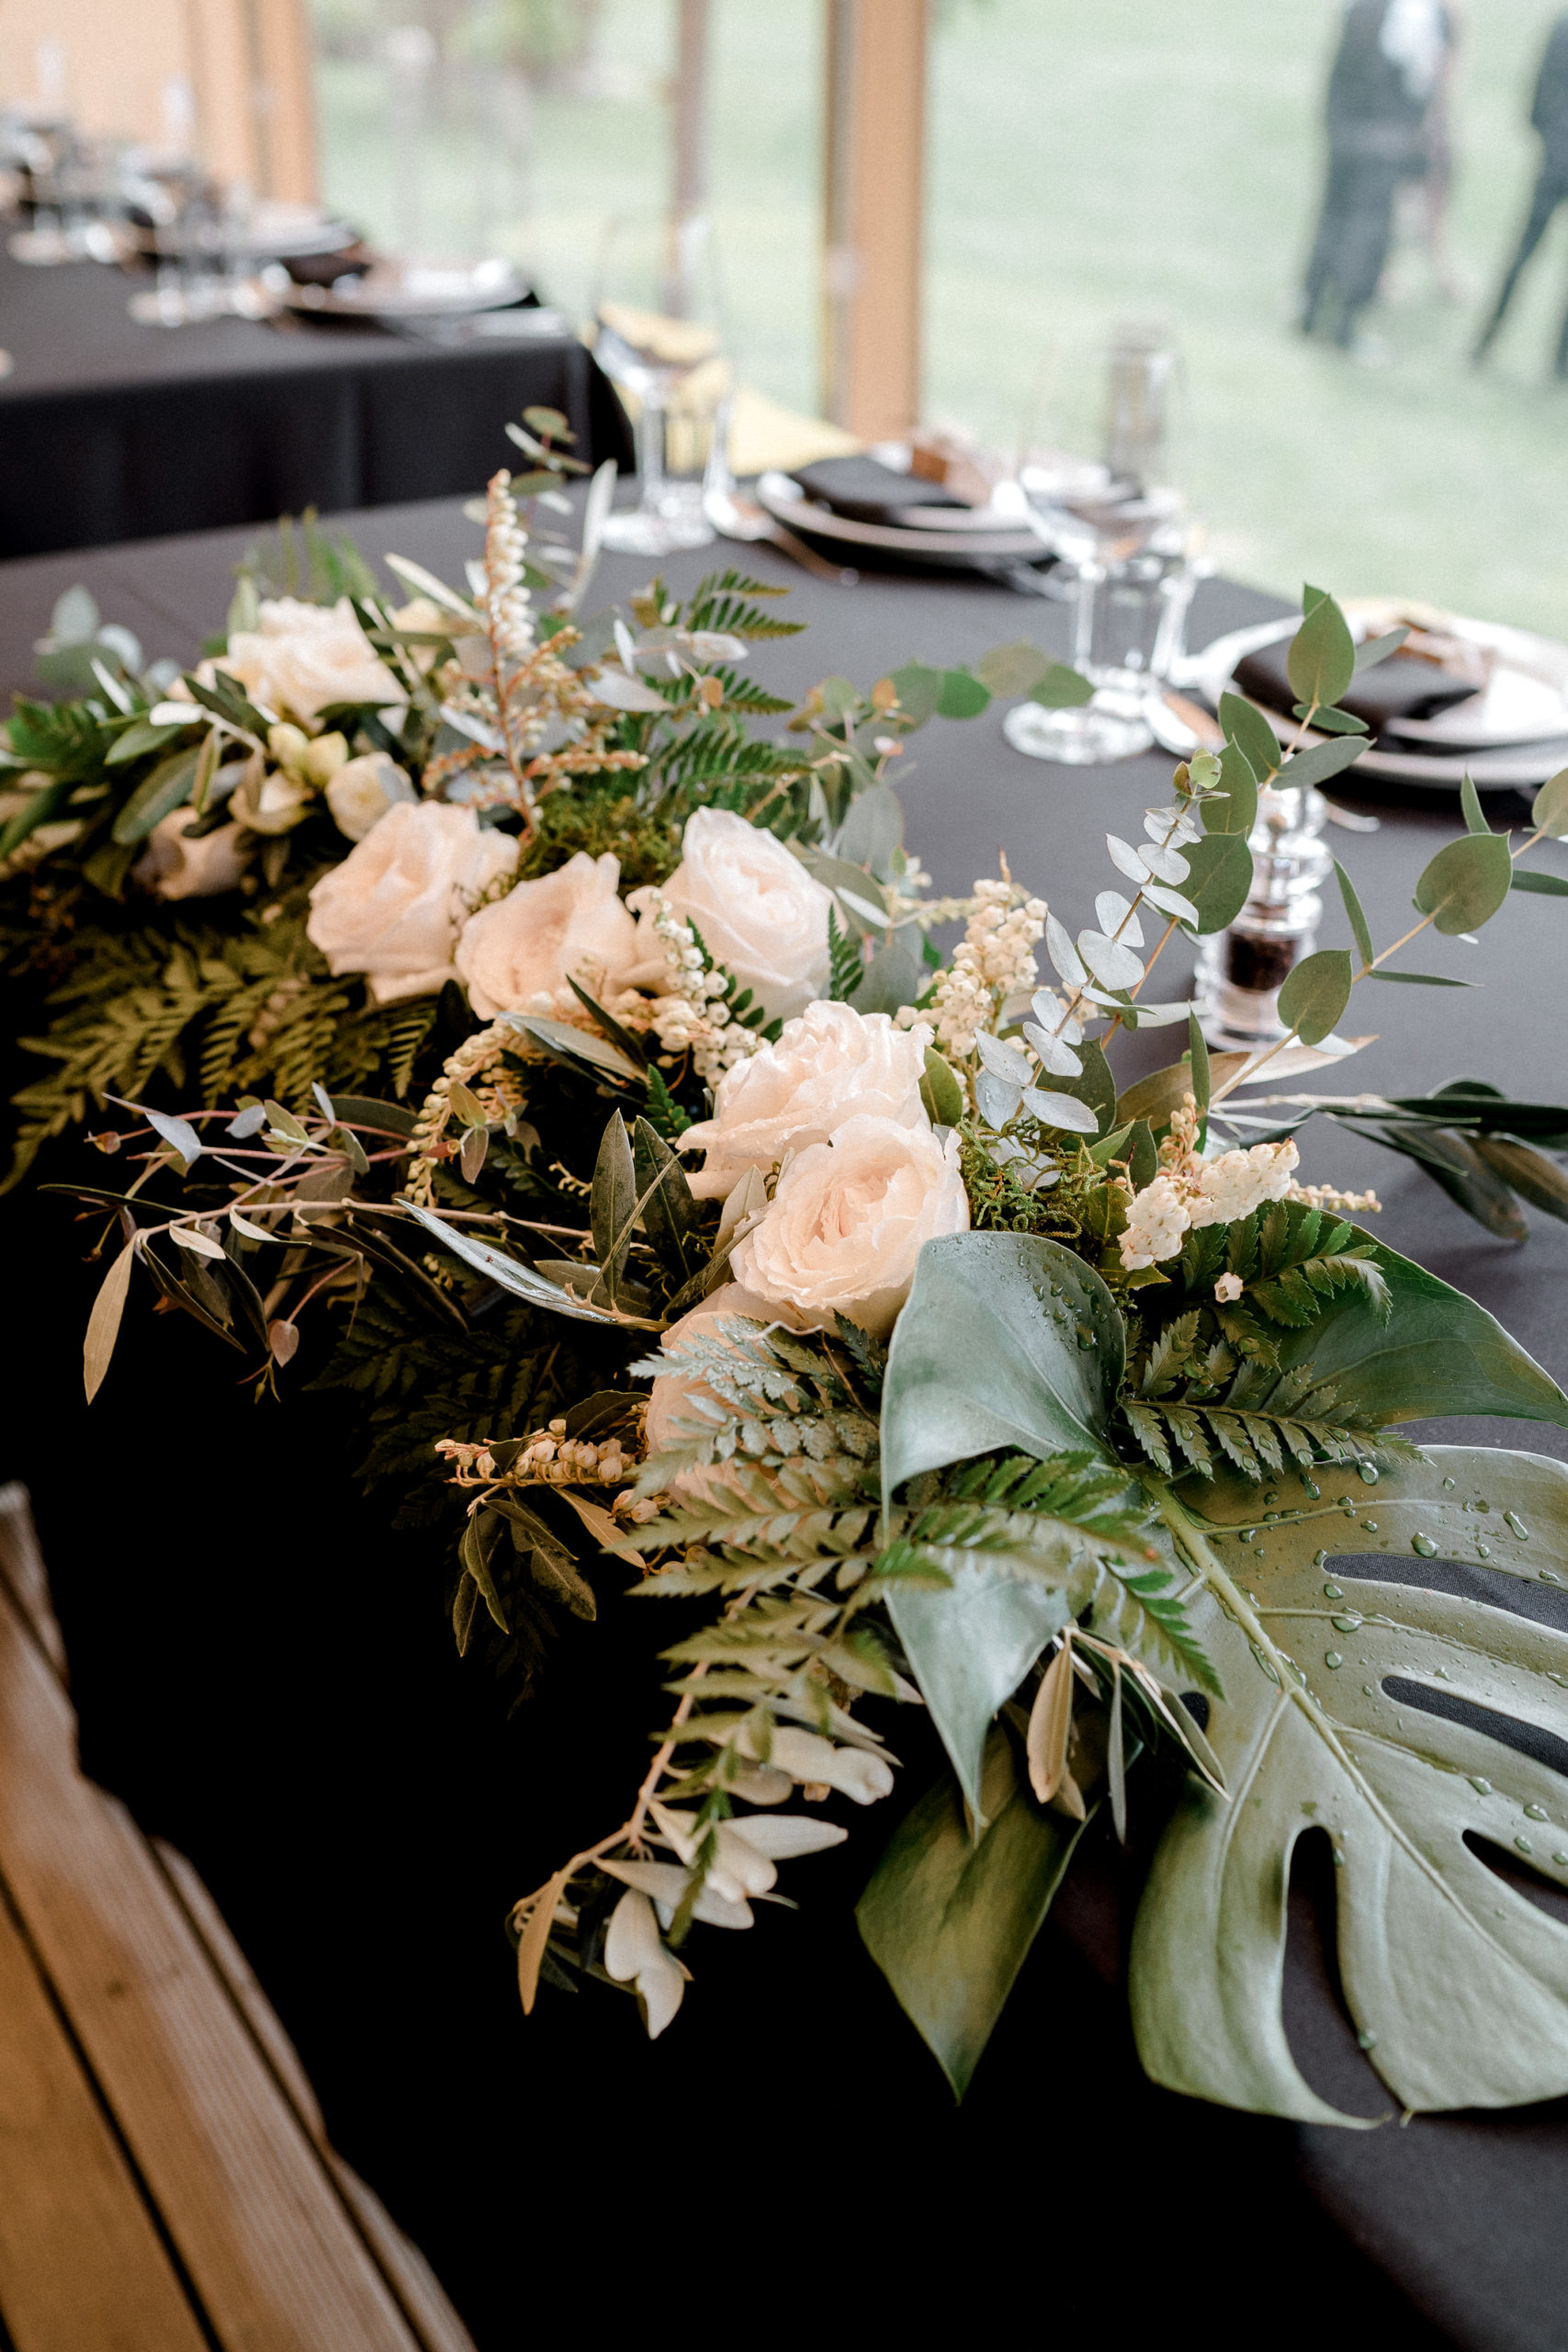 Wedding Floral Centrepiece table set up